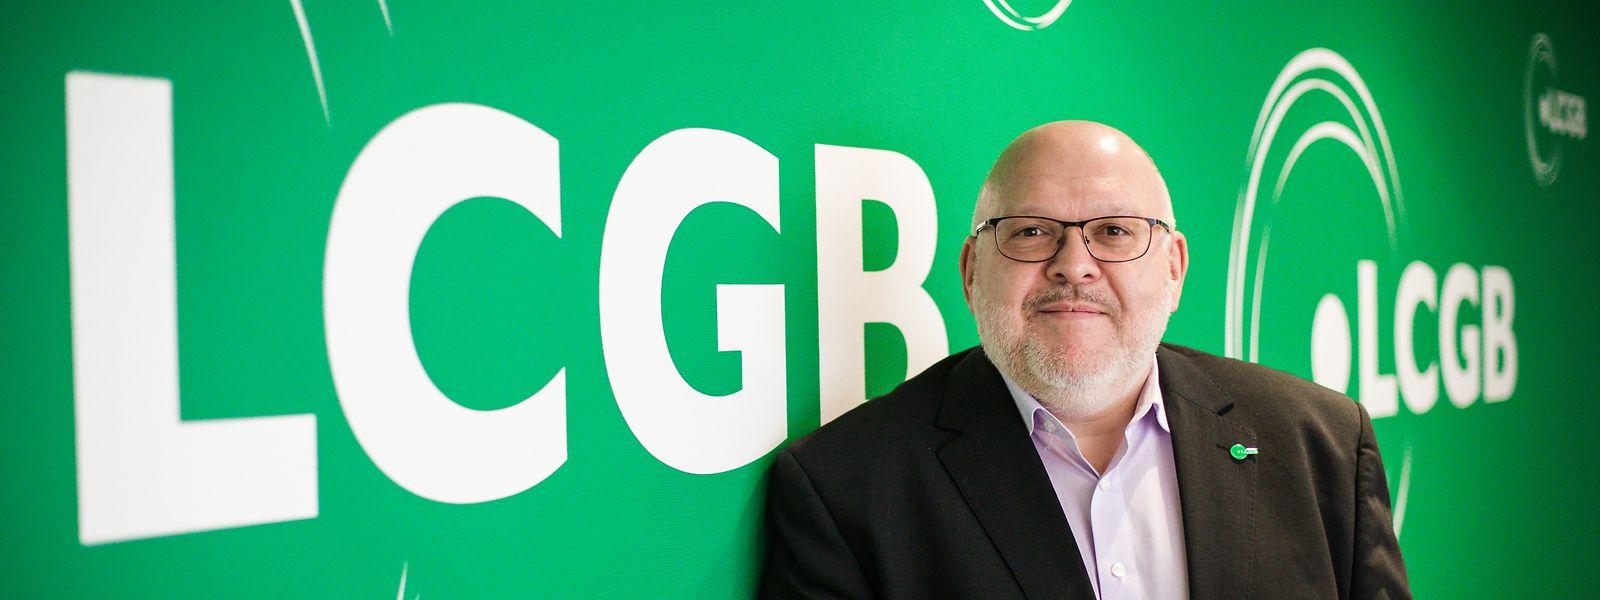 LCGB-Nationalpräsident Patrick Dury.